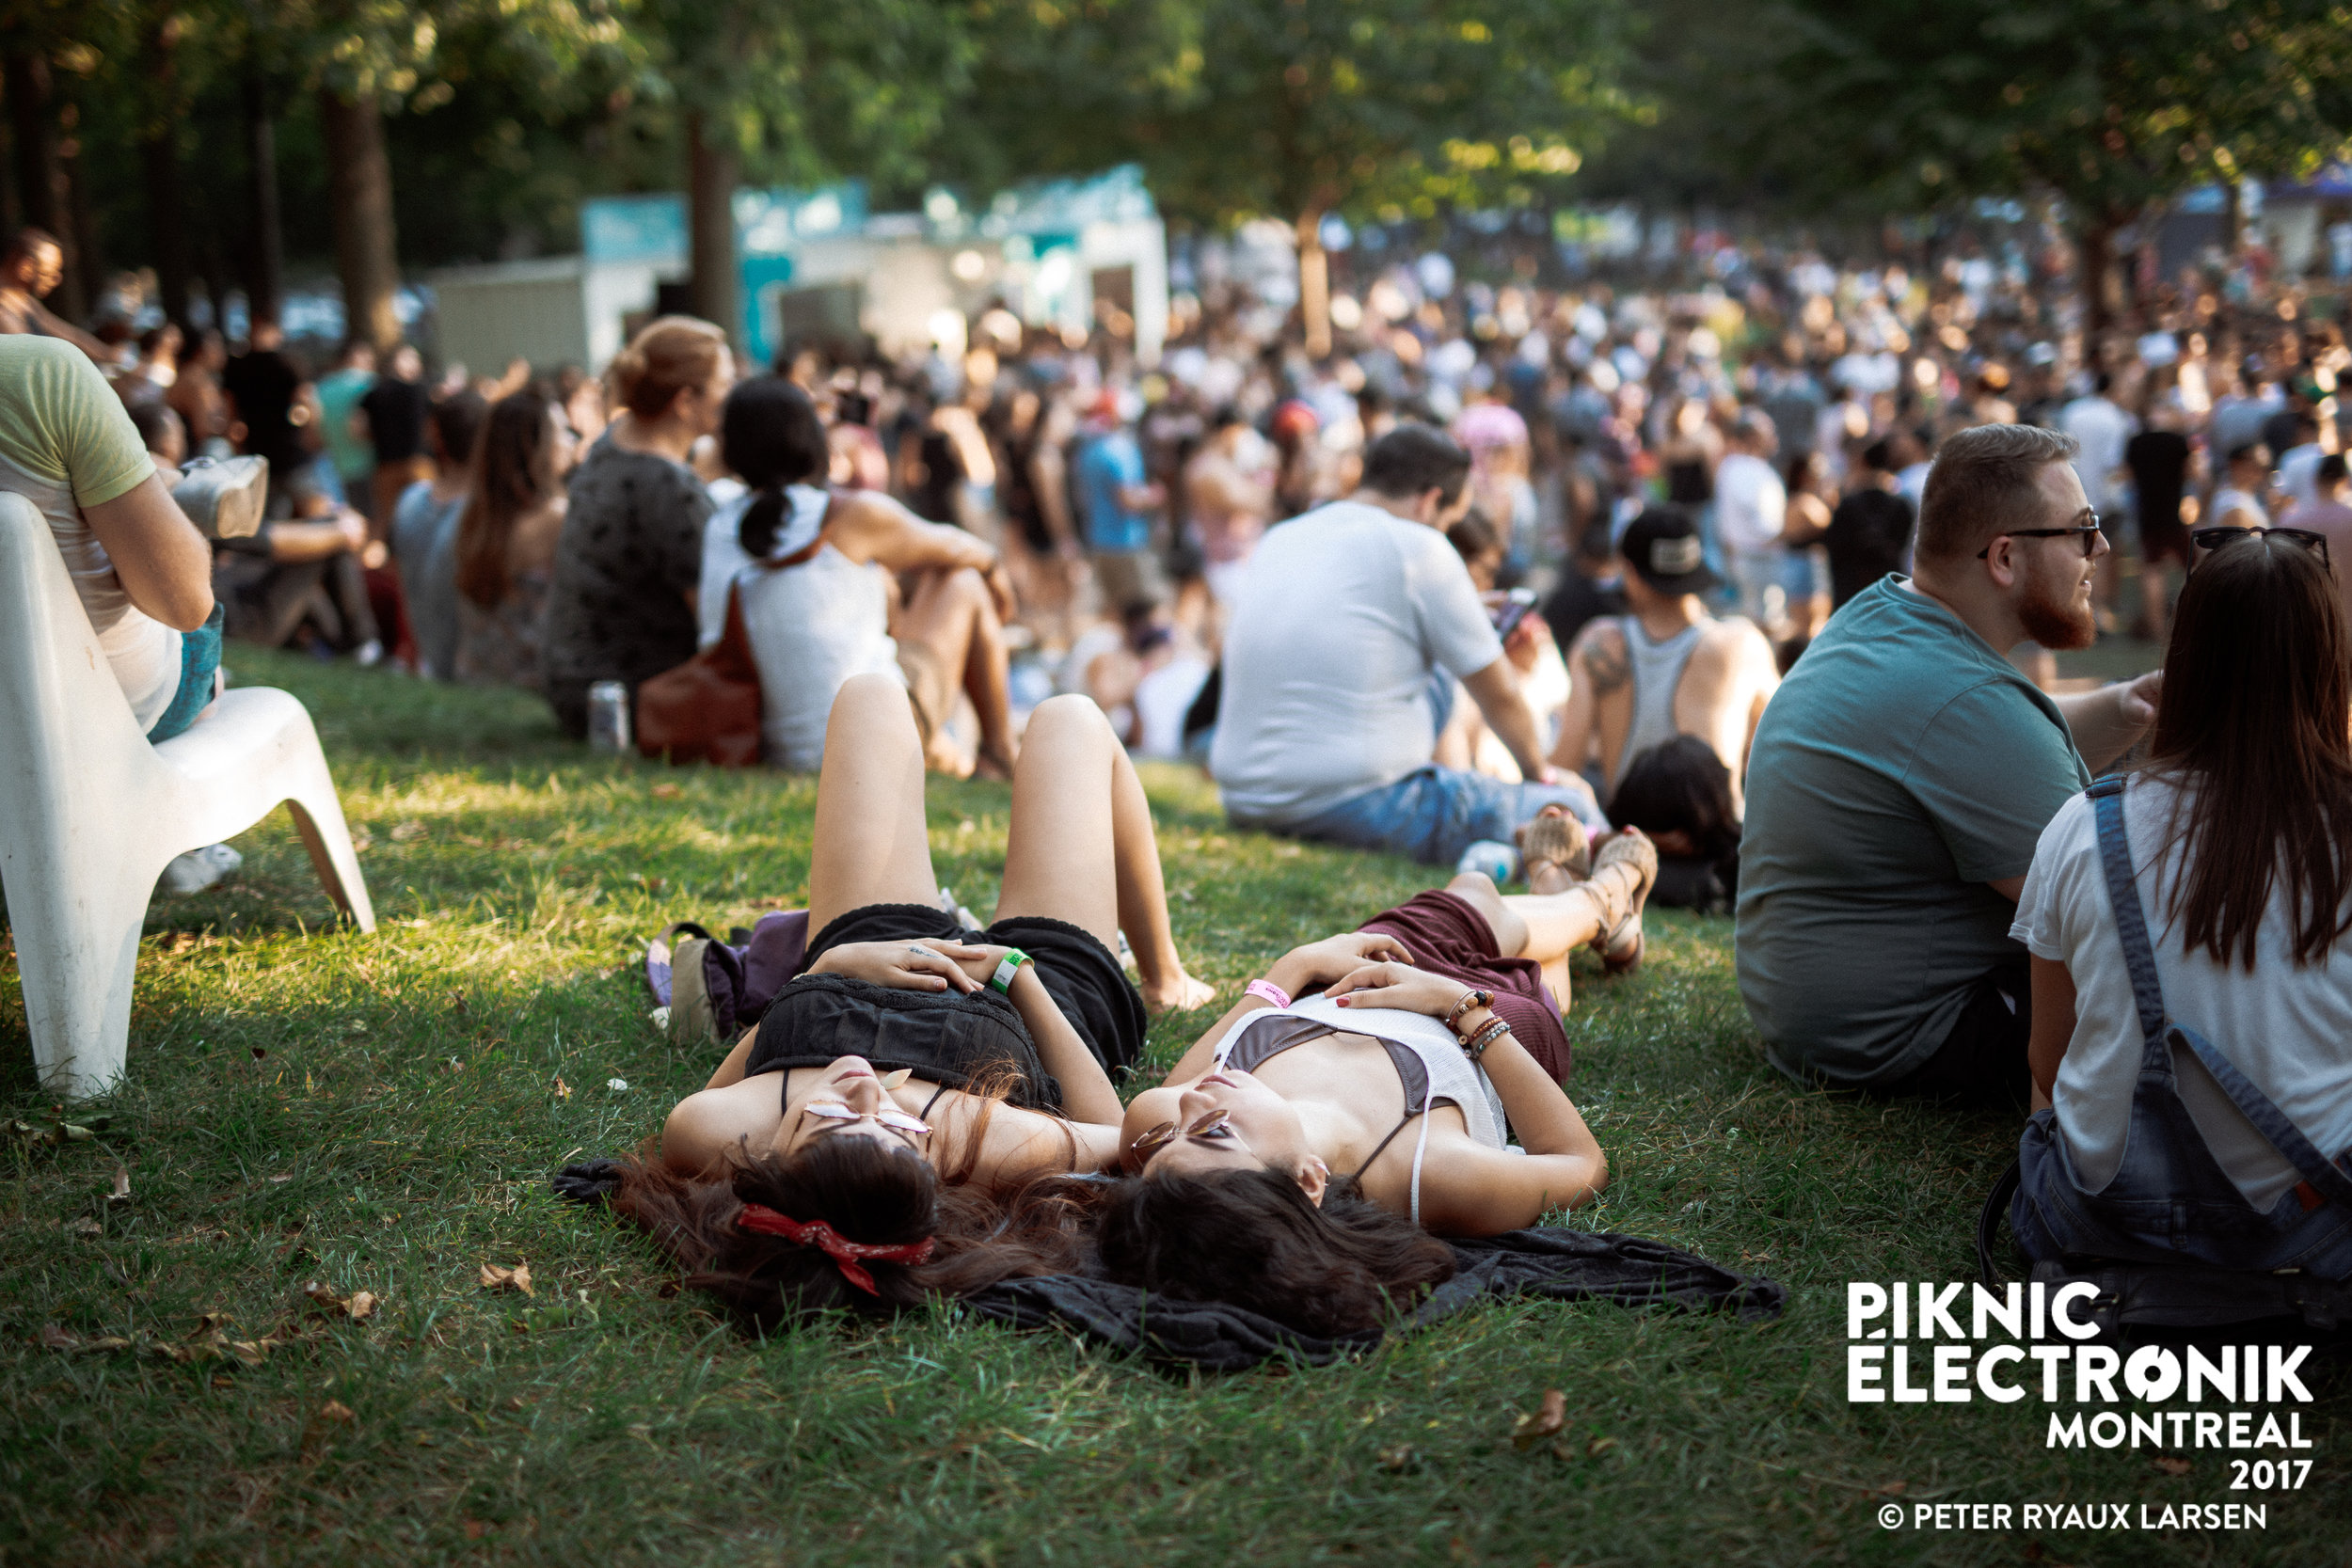 Piknic Electronik #19 - 060 - 20170924 - 0069.jpg